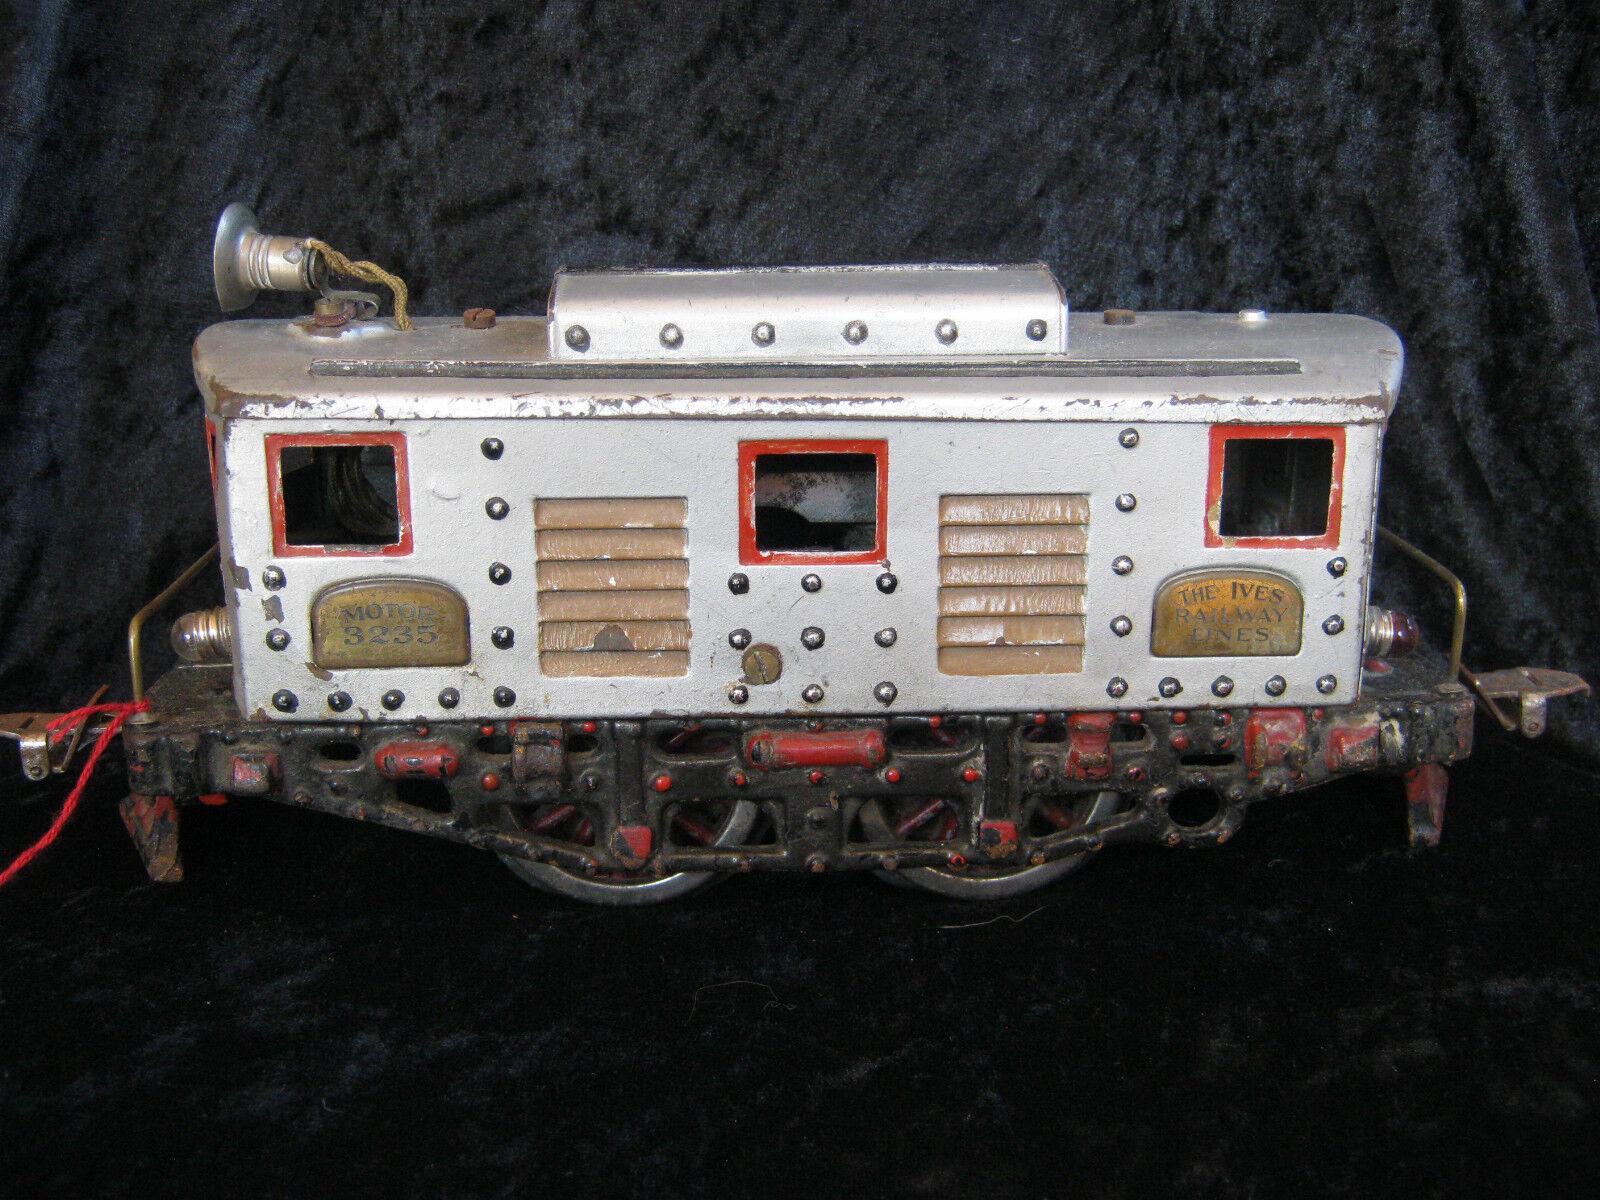 Uralte Spur 2 Yves E-Lok 3235, rare Yves gauge II electric locomotive 3235